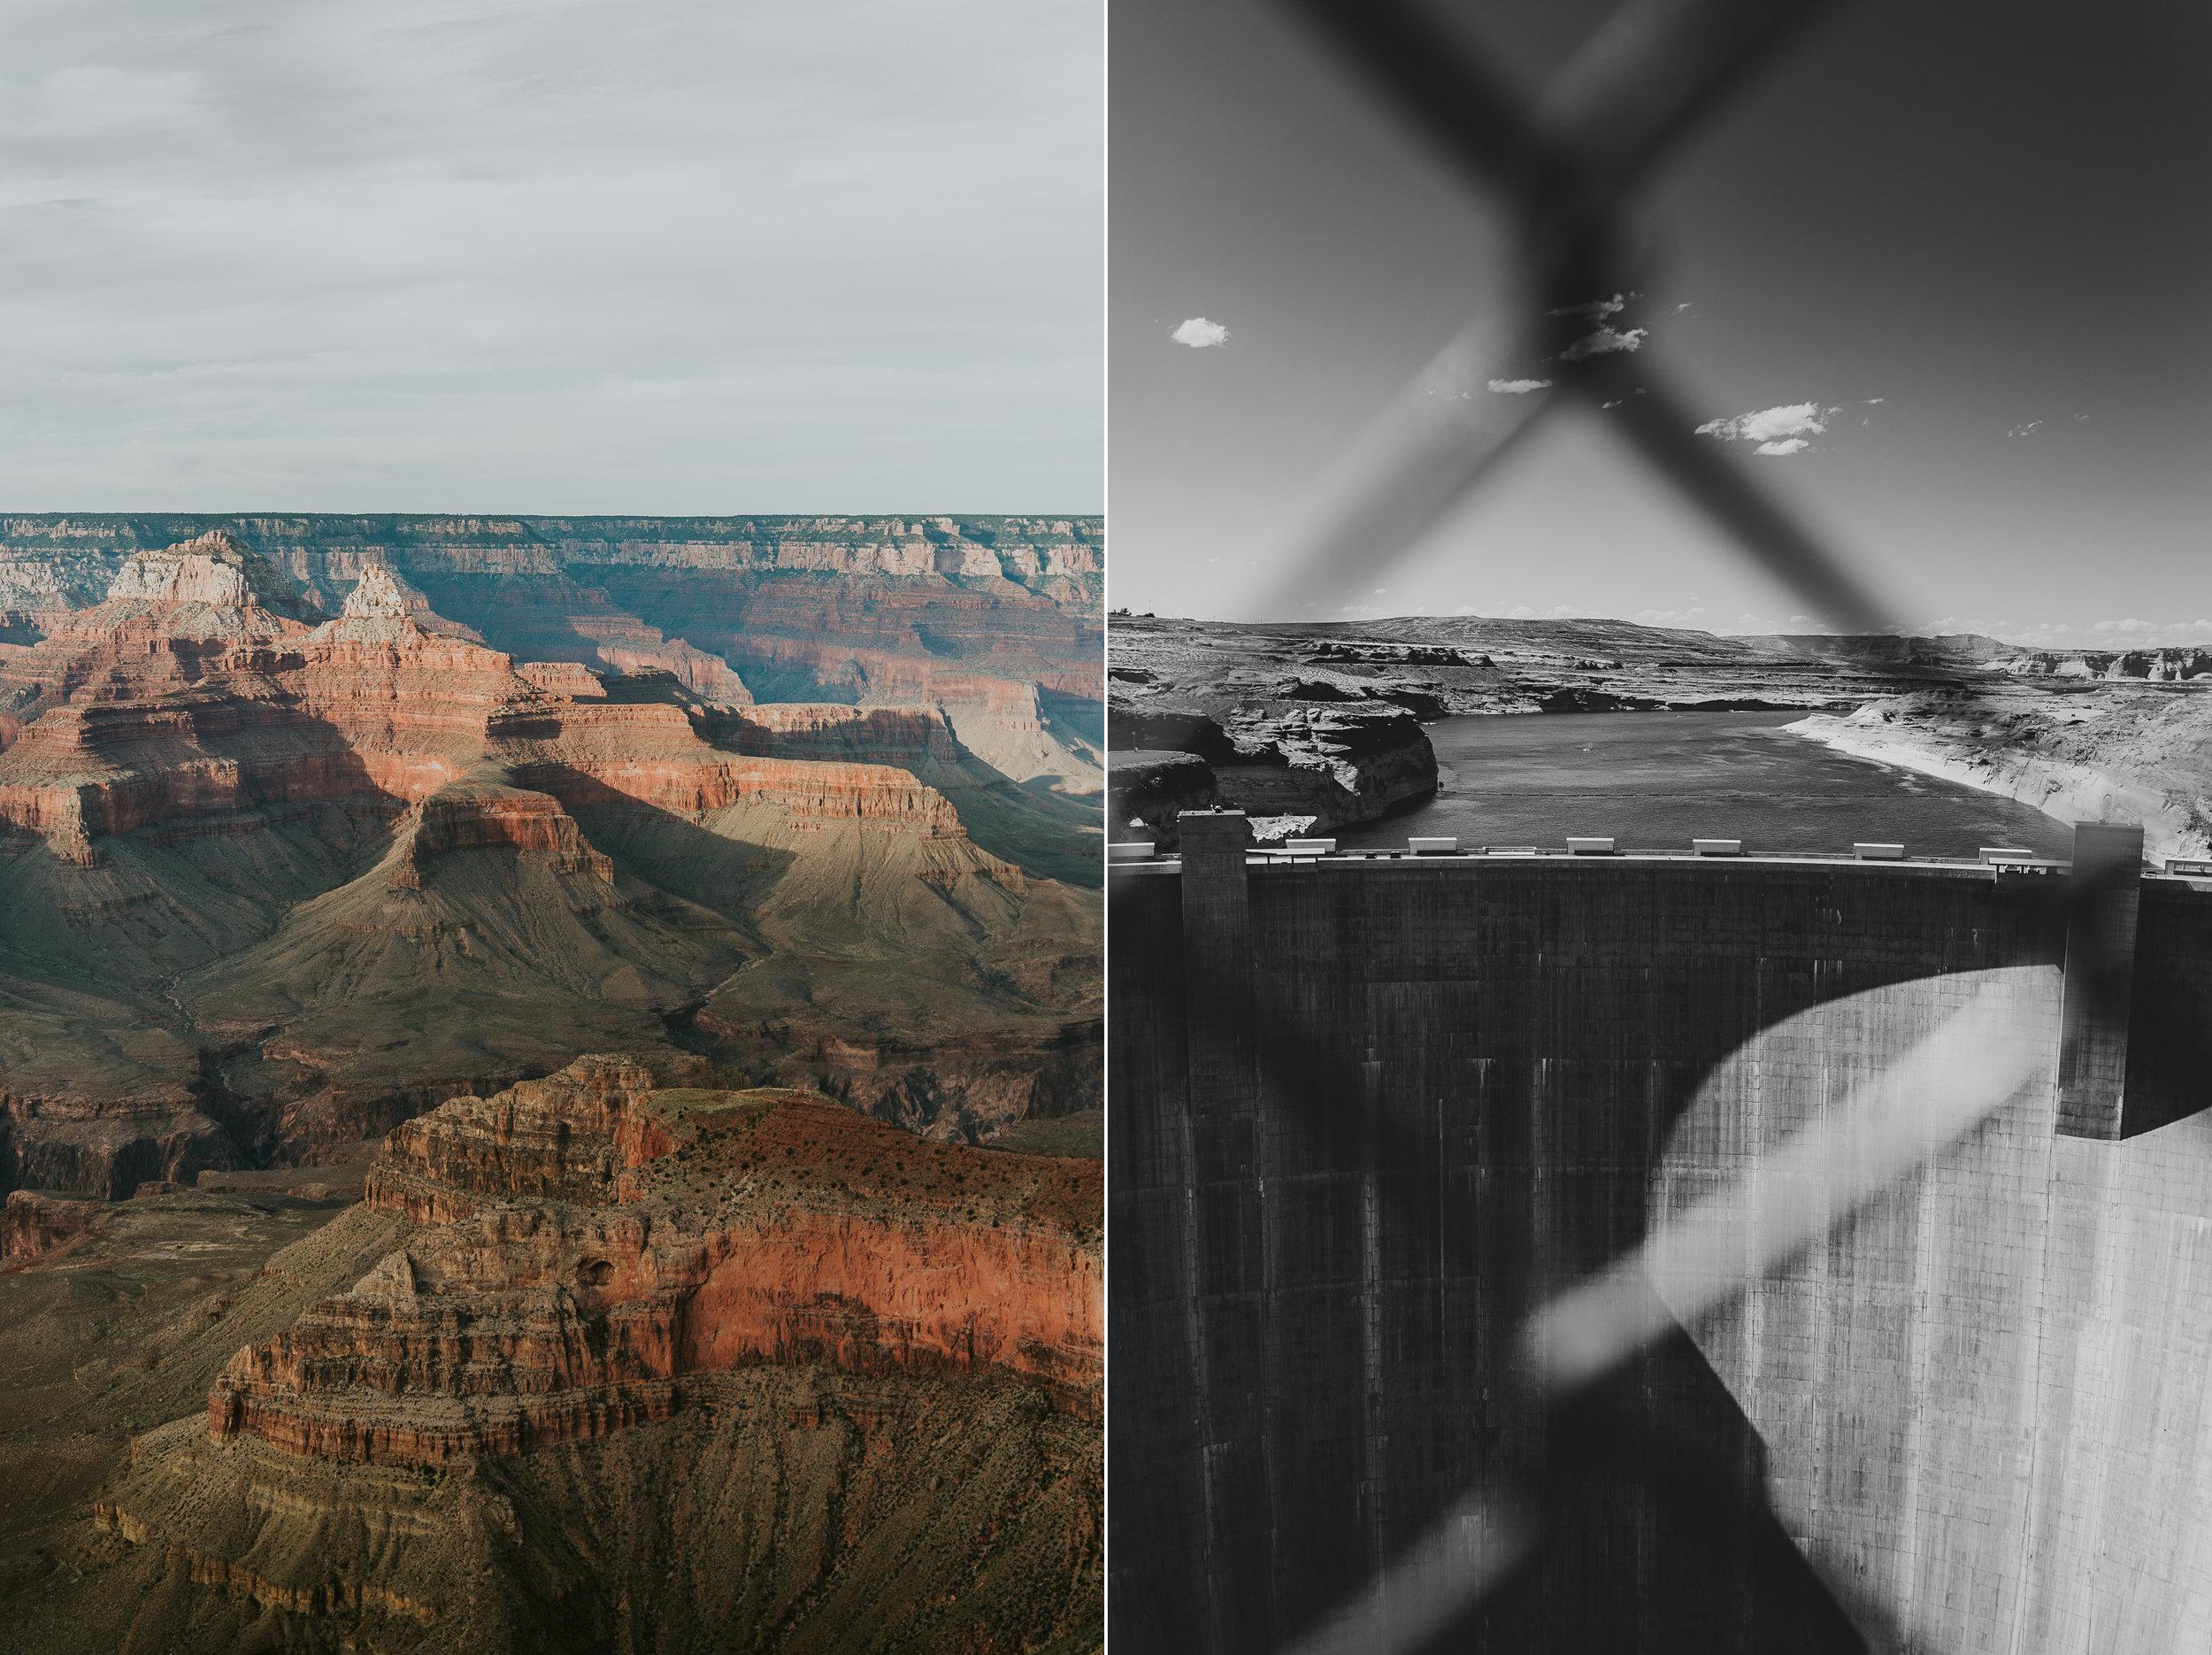 Arizona_combo 1.jpg